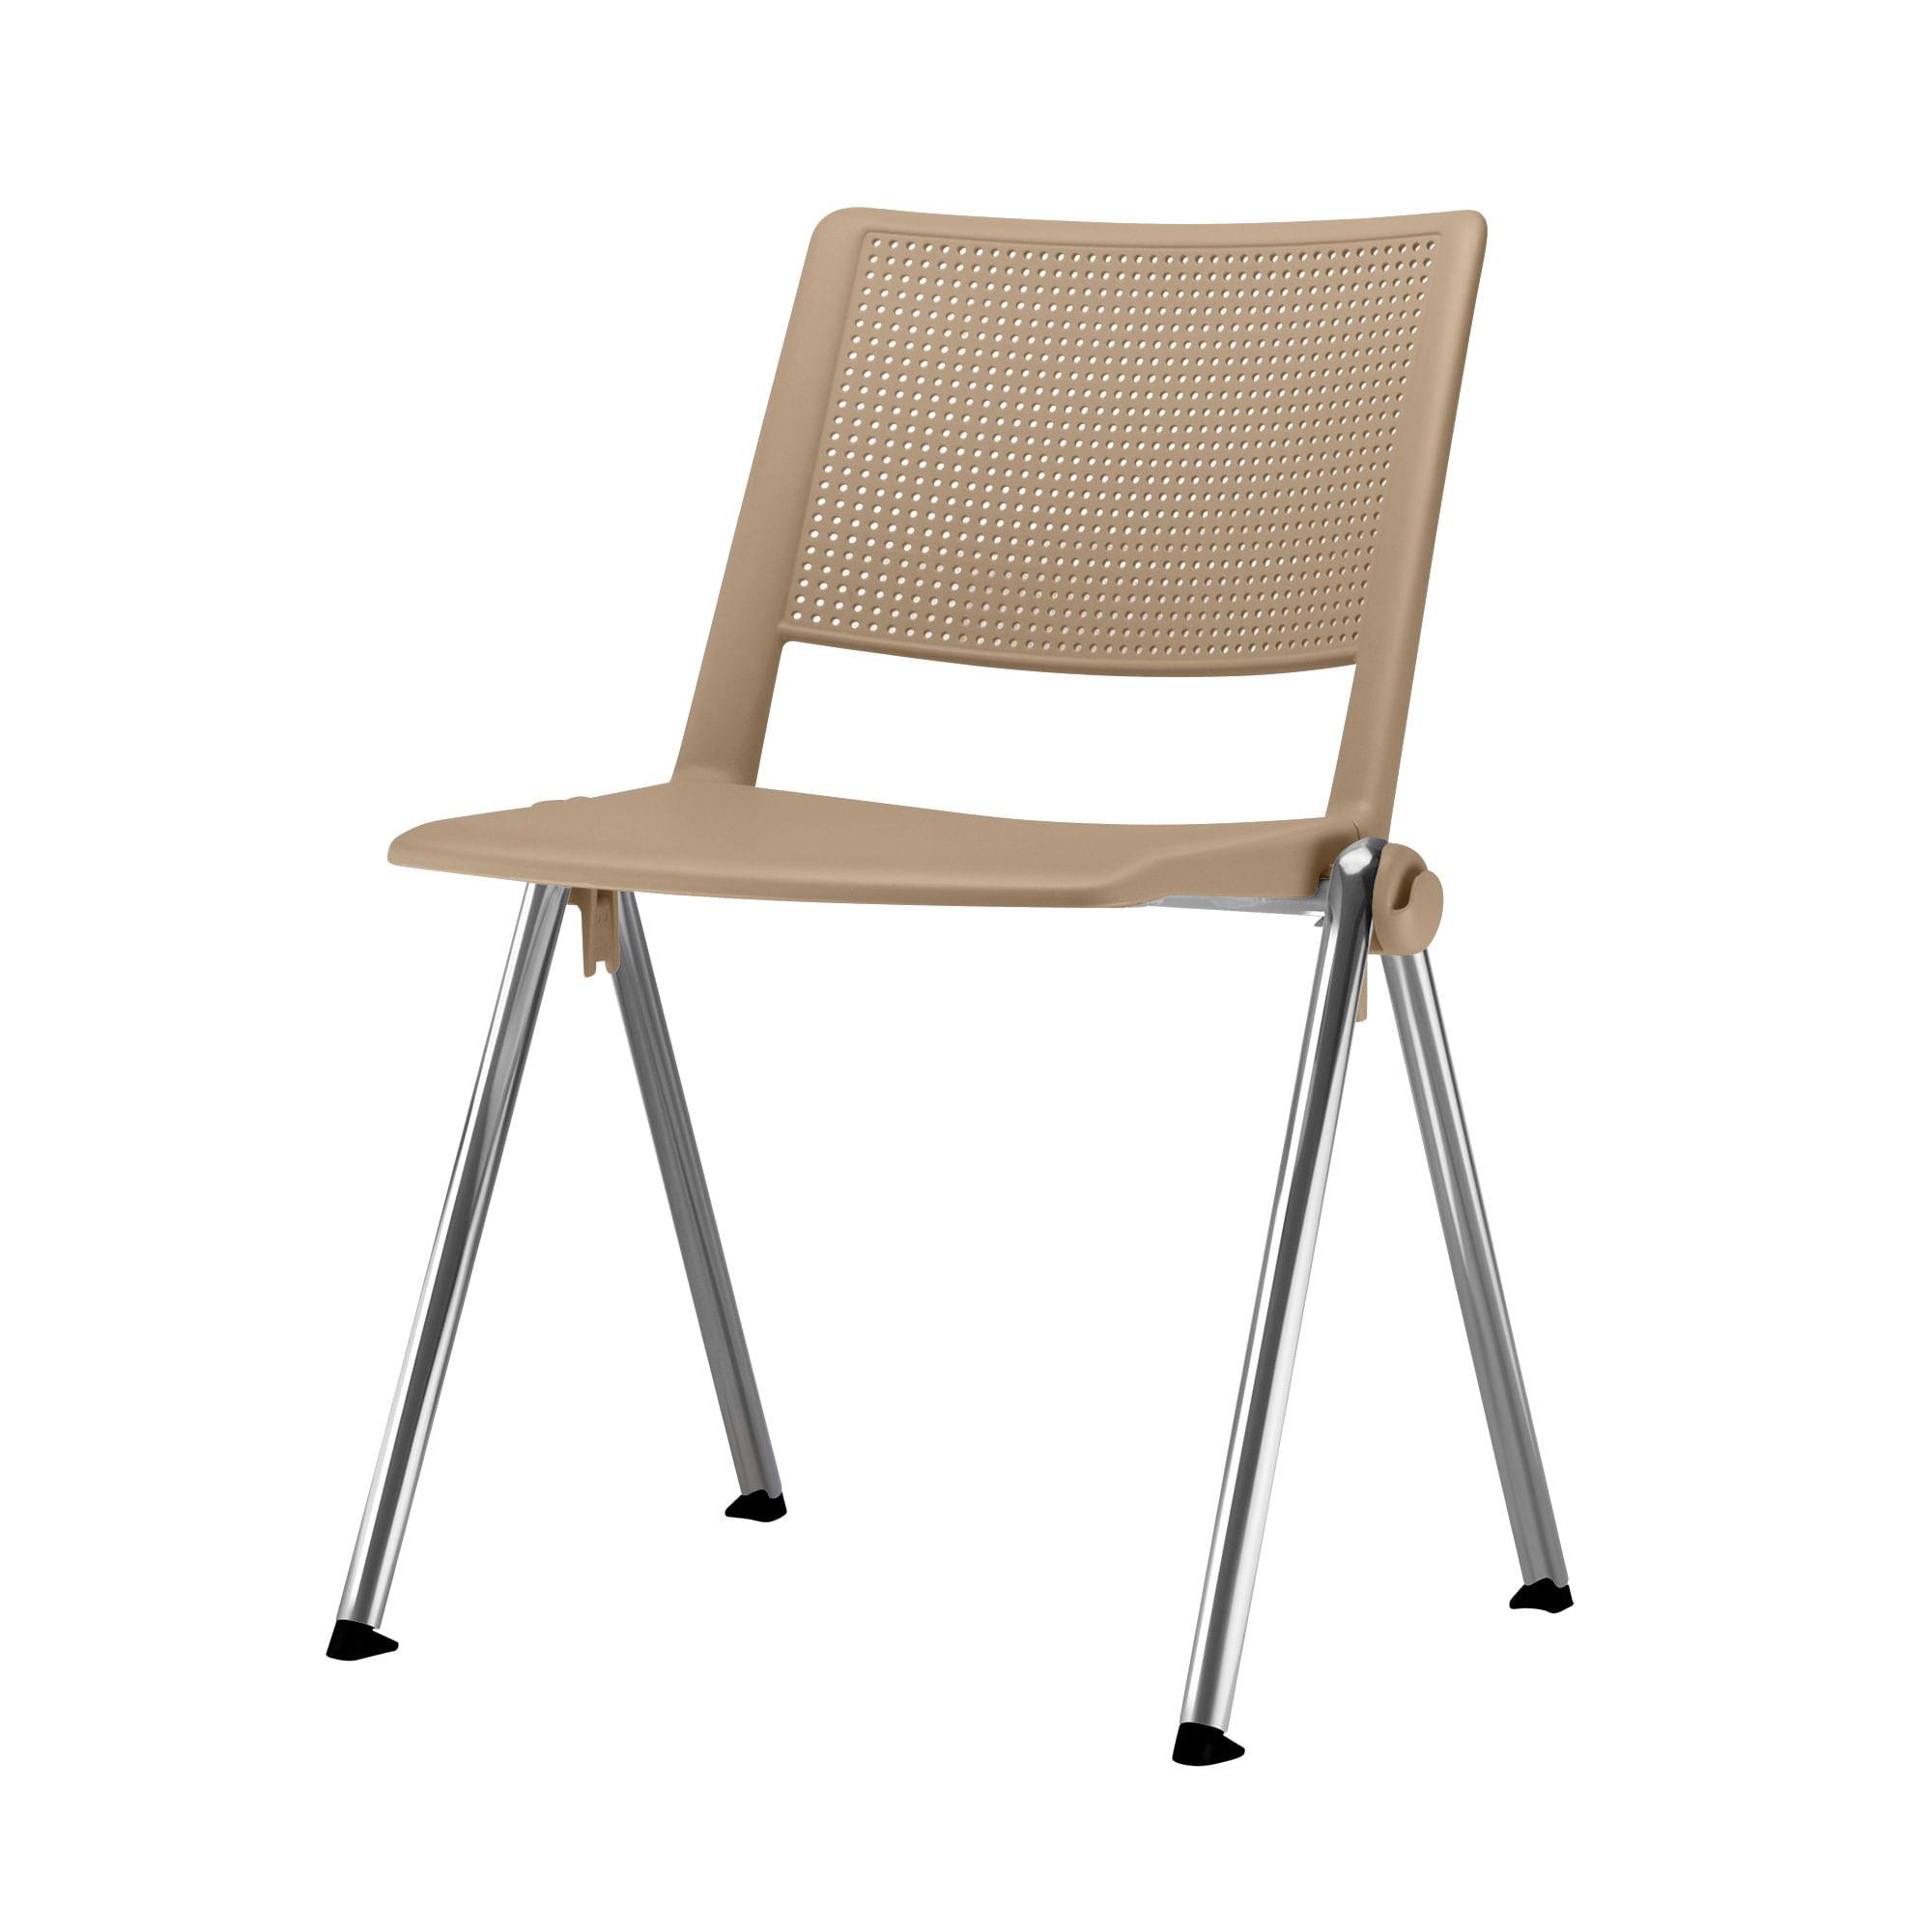 Kit 5 Cadeiras Up Assento Bege Base Fixa Cromada - 57808